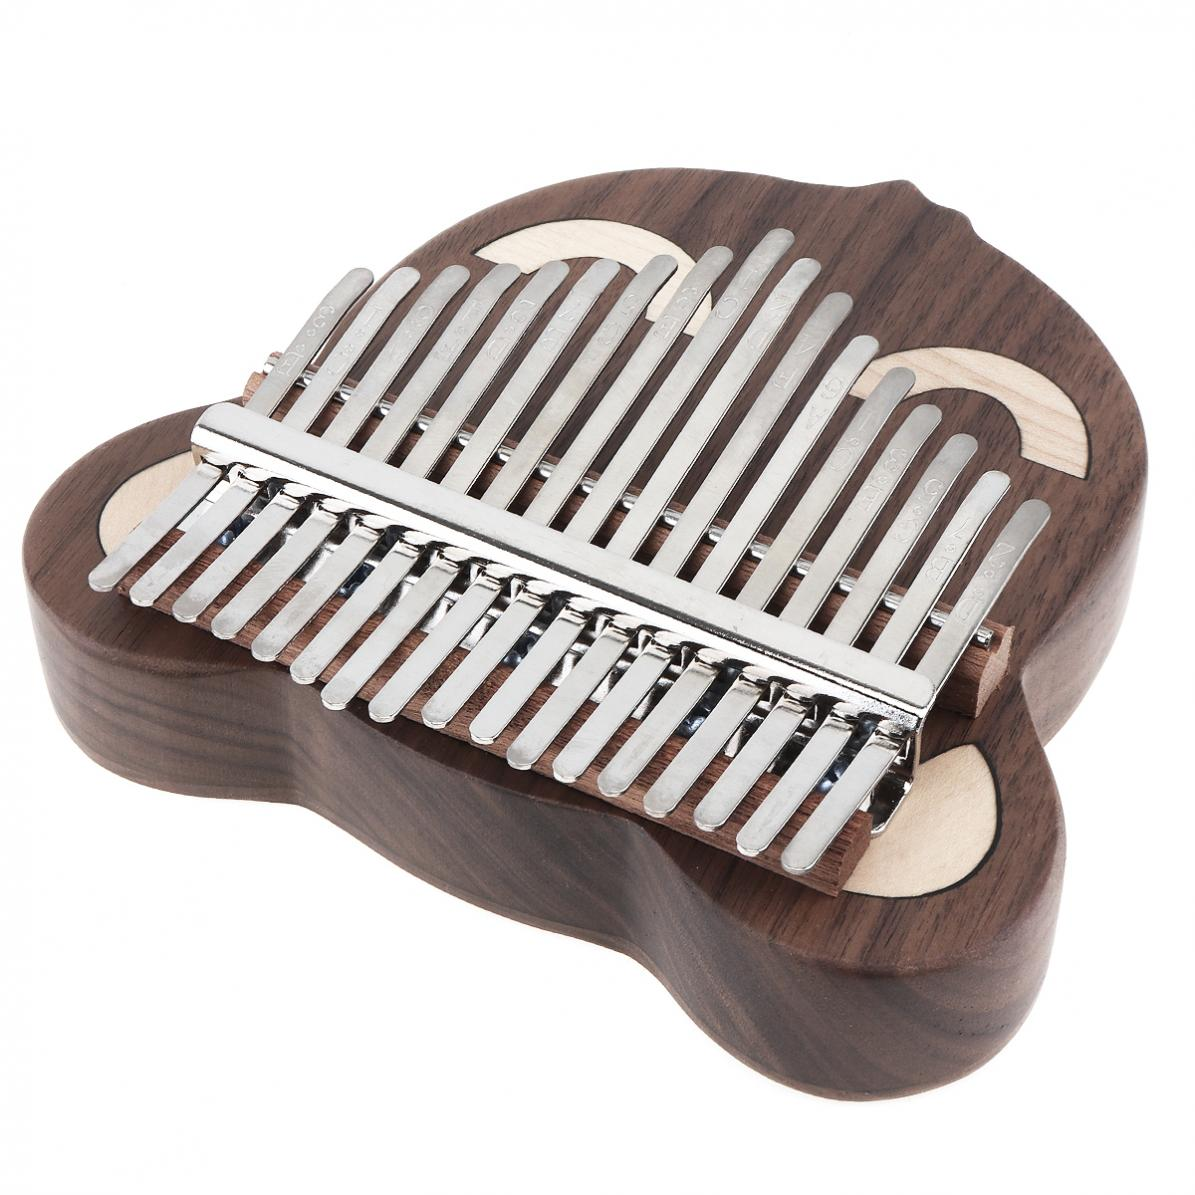 17 Key Thumb Piano Kalimba Hele Single Board Kat/Bear Gezicht Walnoot Mbira Calimba met Tuning Hamer Hout Muzikale instrumenten - 5